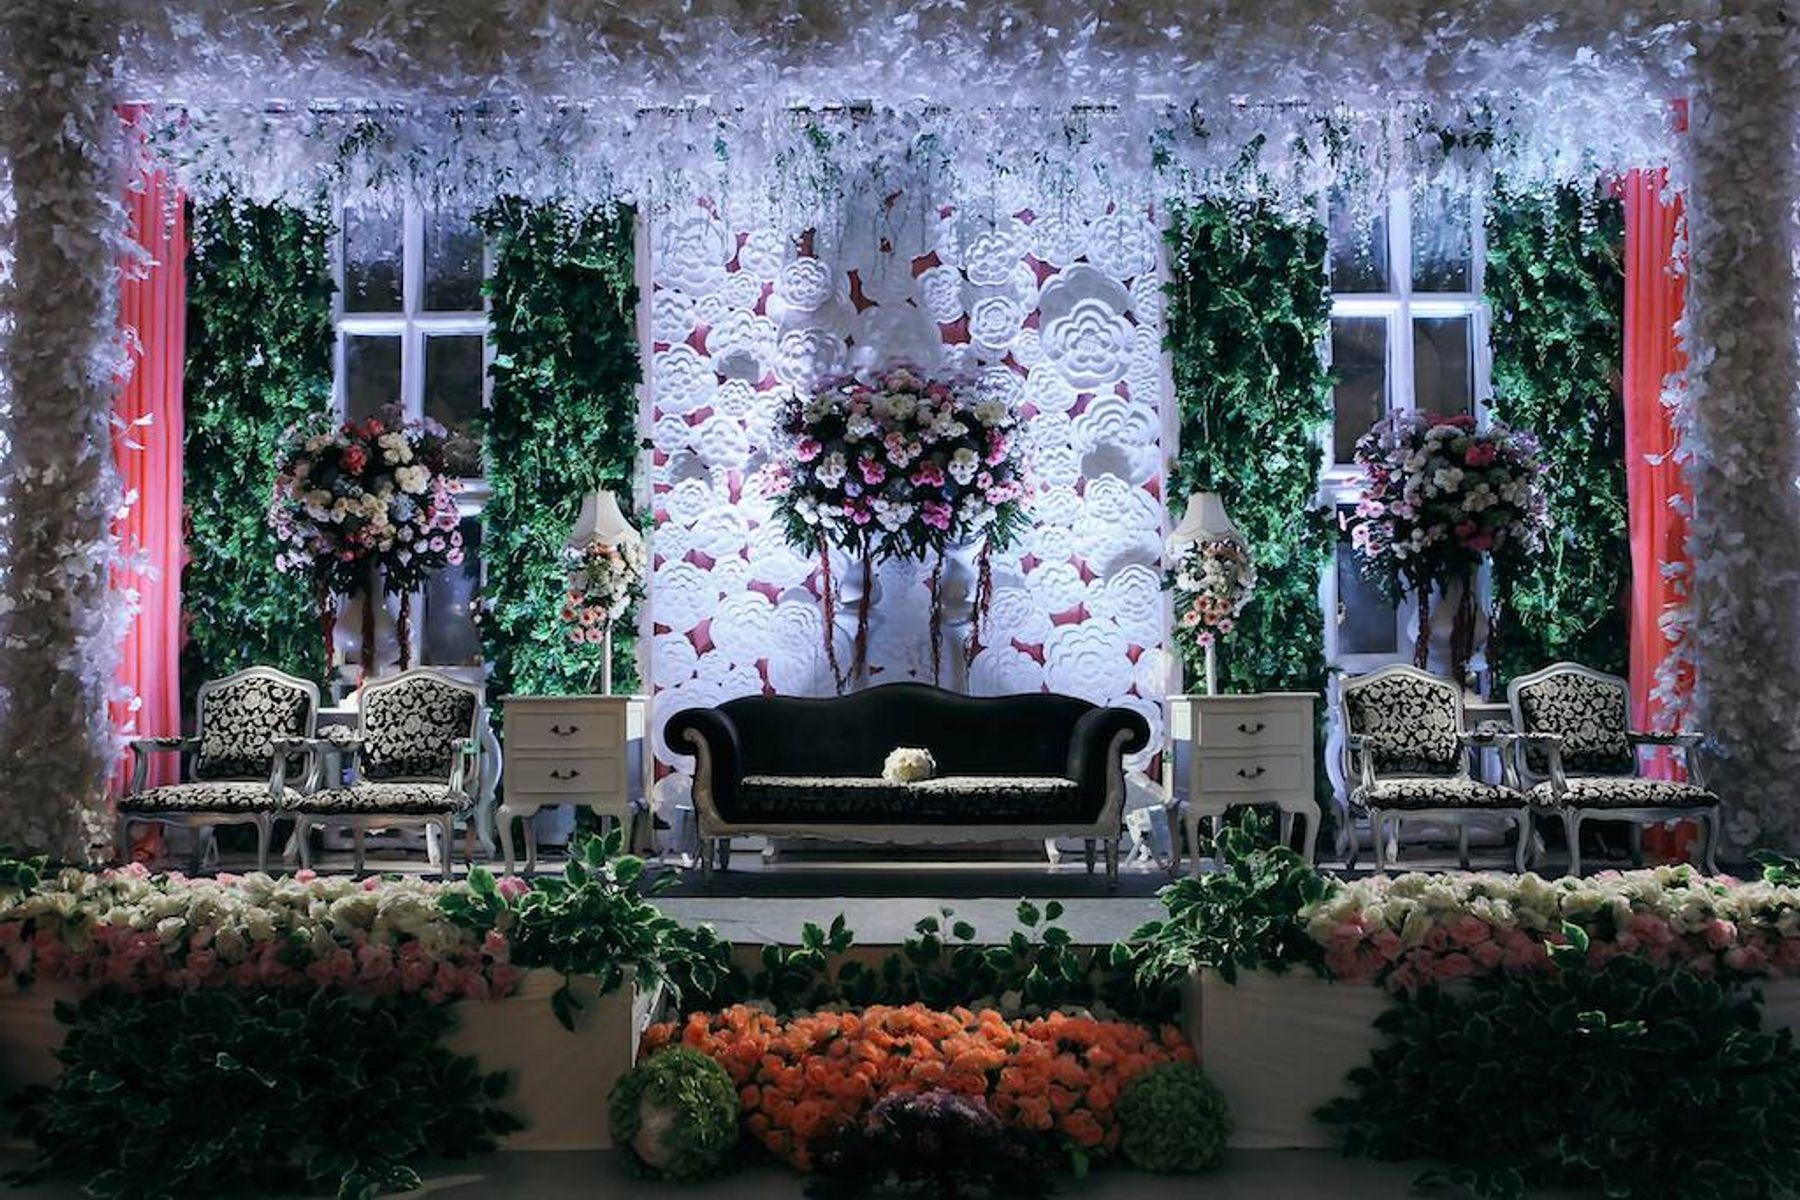 tempat pernikahan tradisional dengan lorong dan kursi